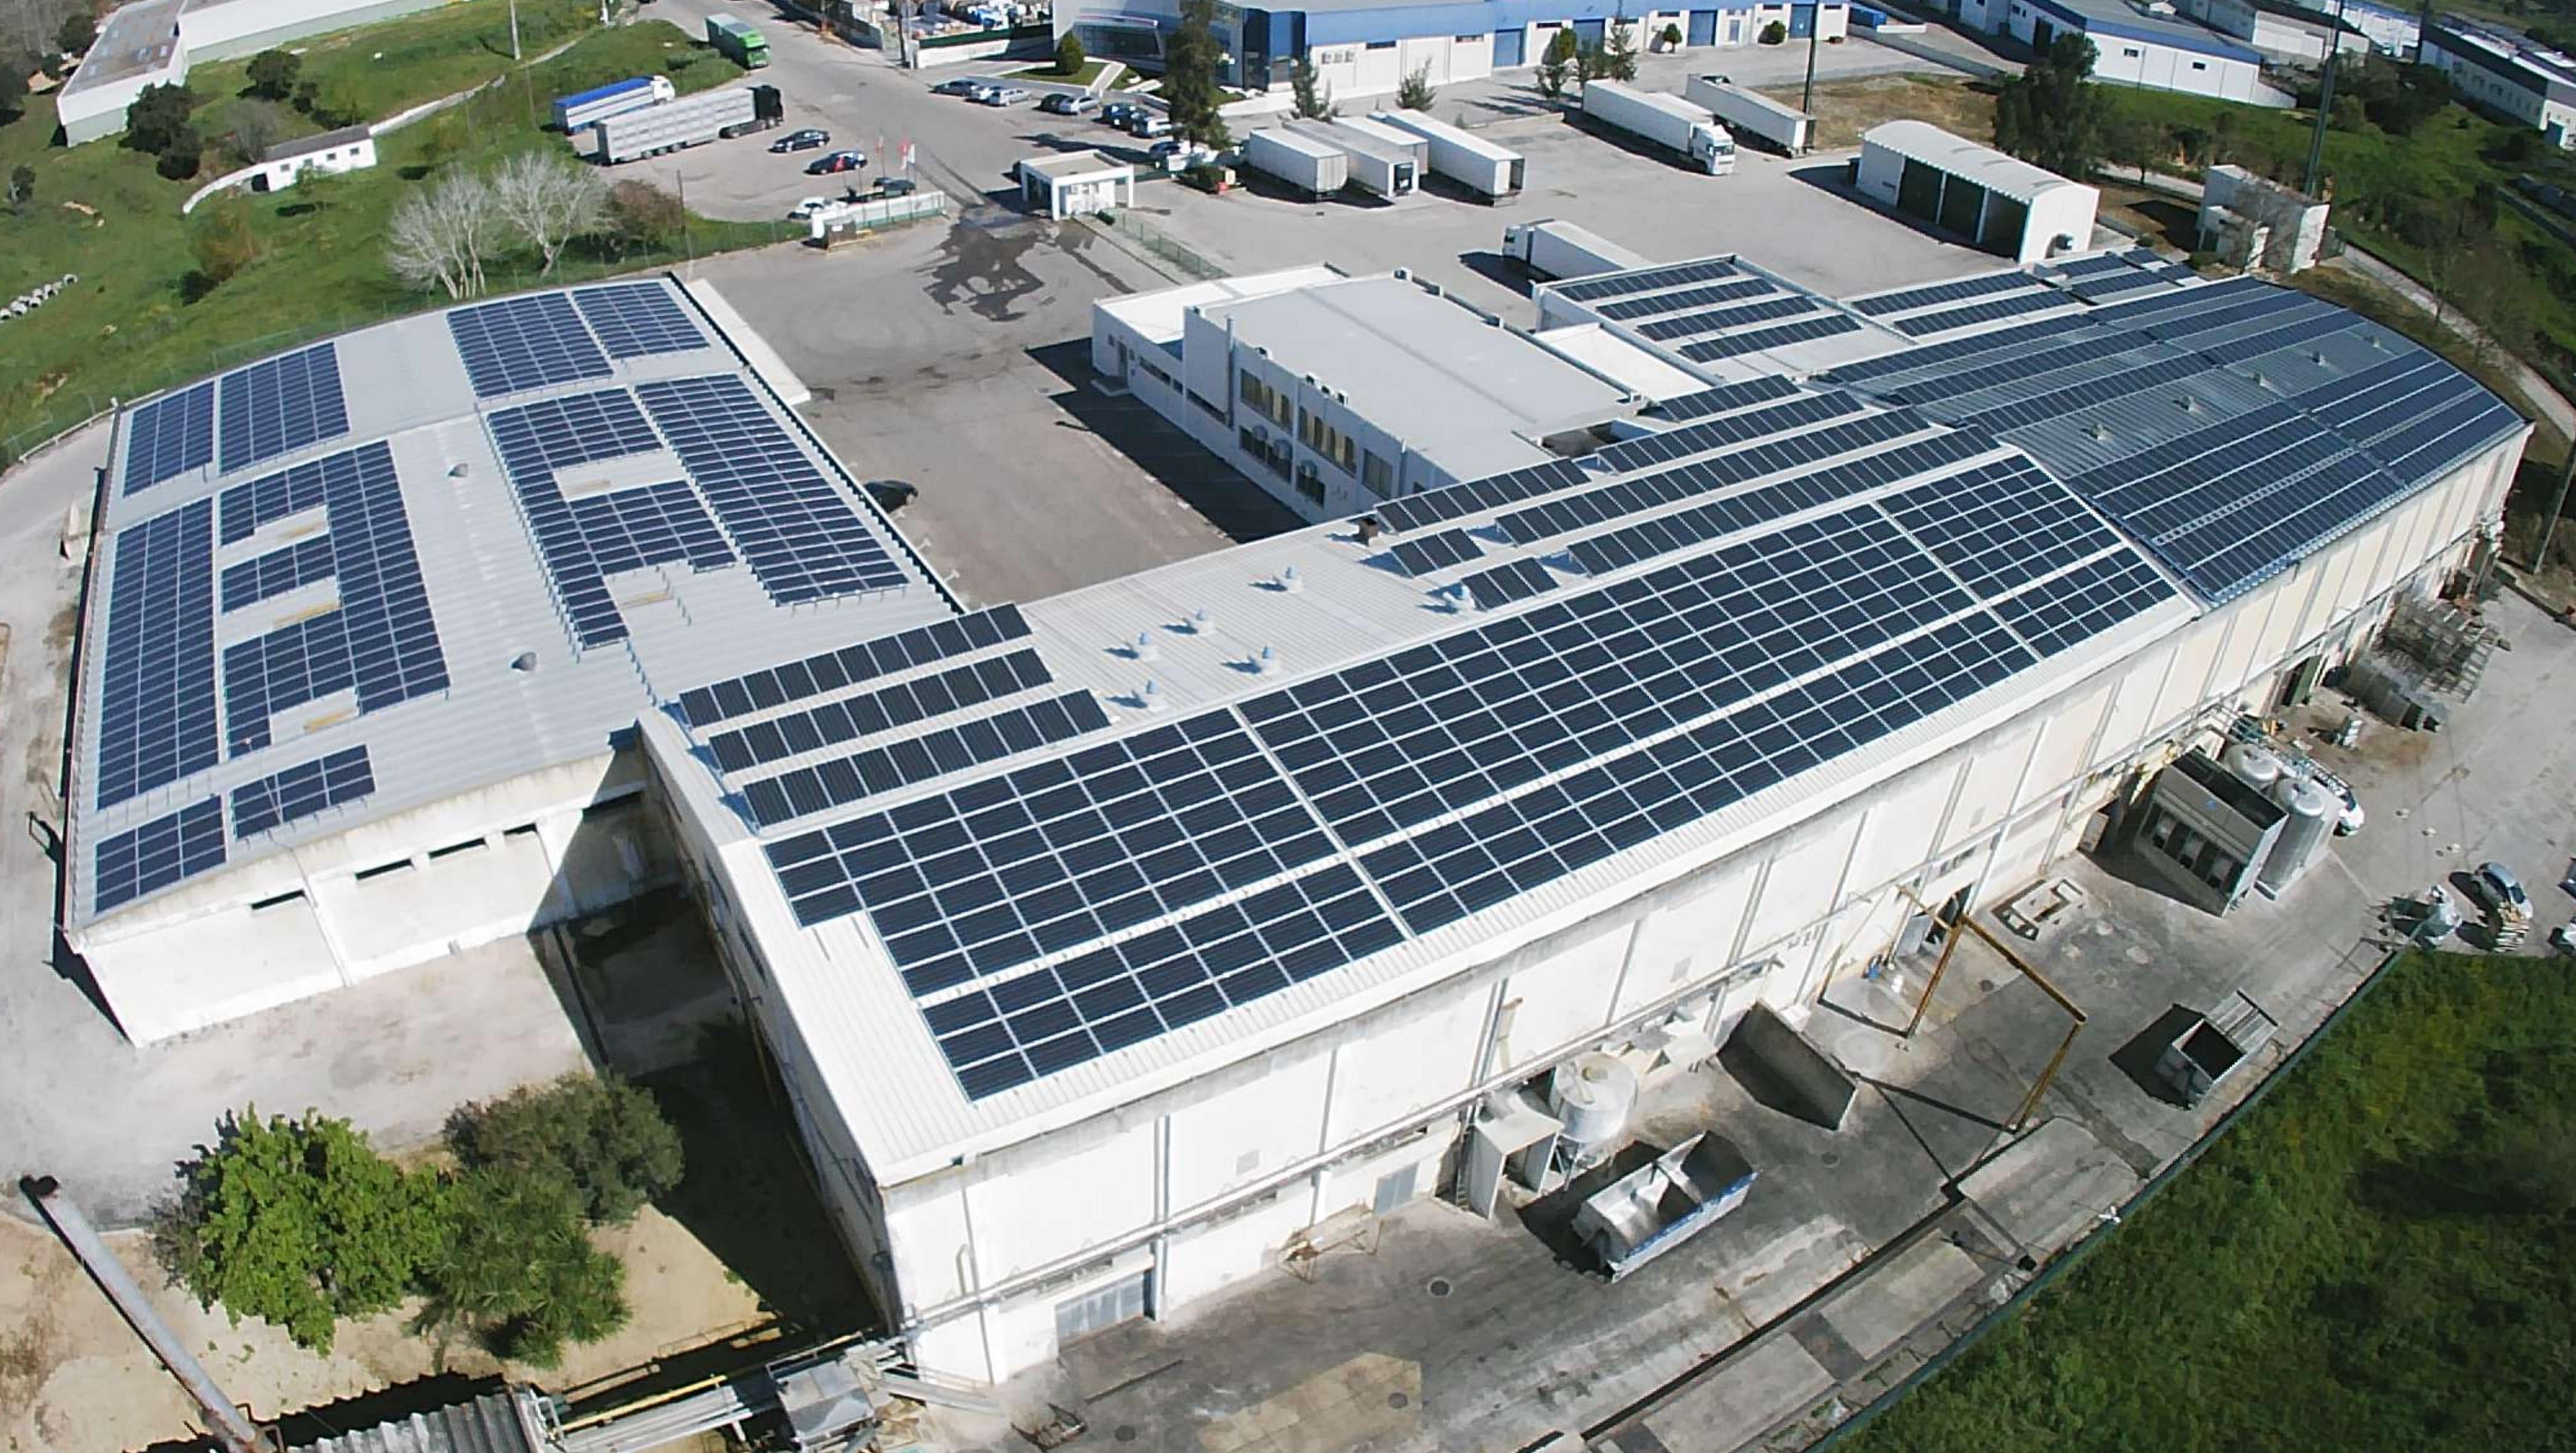 autoconsumo em indústria Santacarnes Santarém Portugal solar fotovoltaico